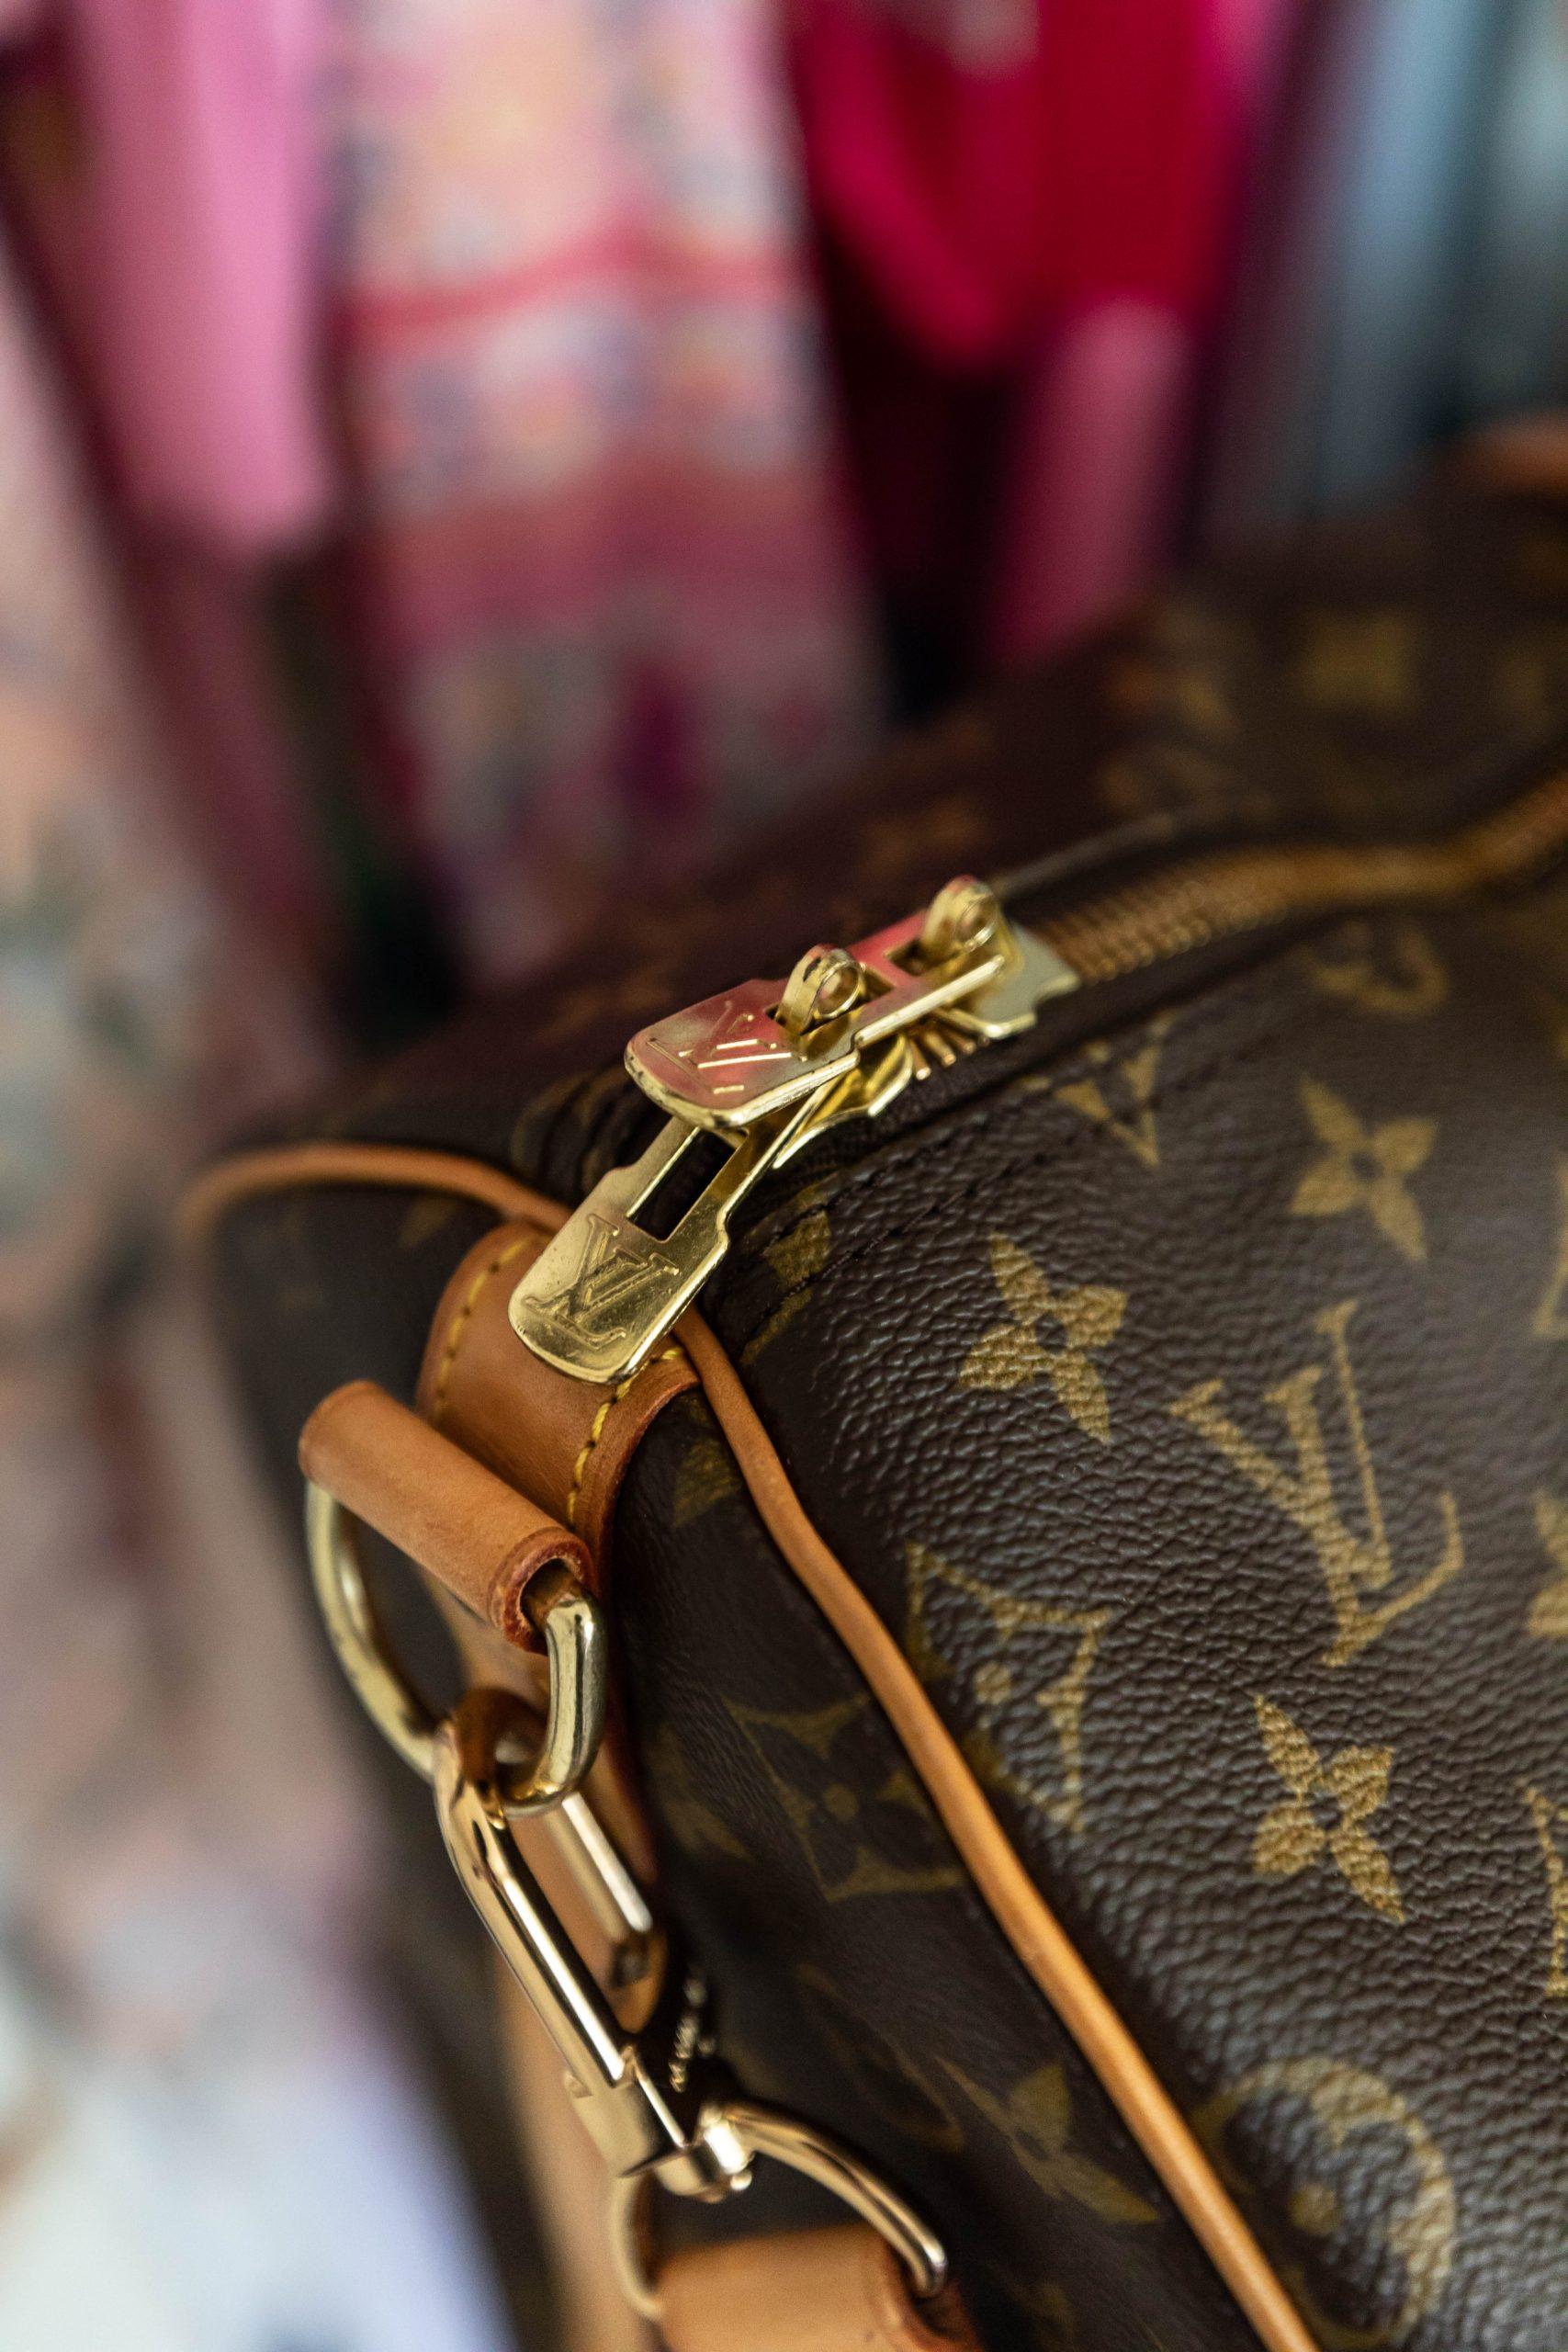 Authentic Louis Vuitton Keepall Bandoulière 55 Monogram Duffle Bag Review from Shopbop Archive by Annie Fairfax